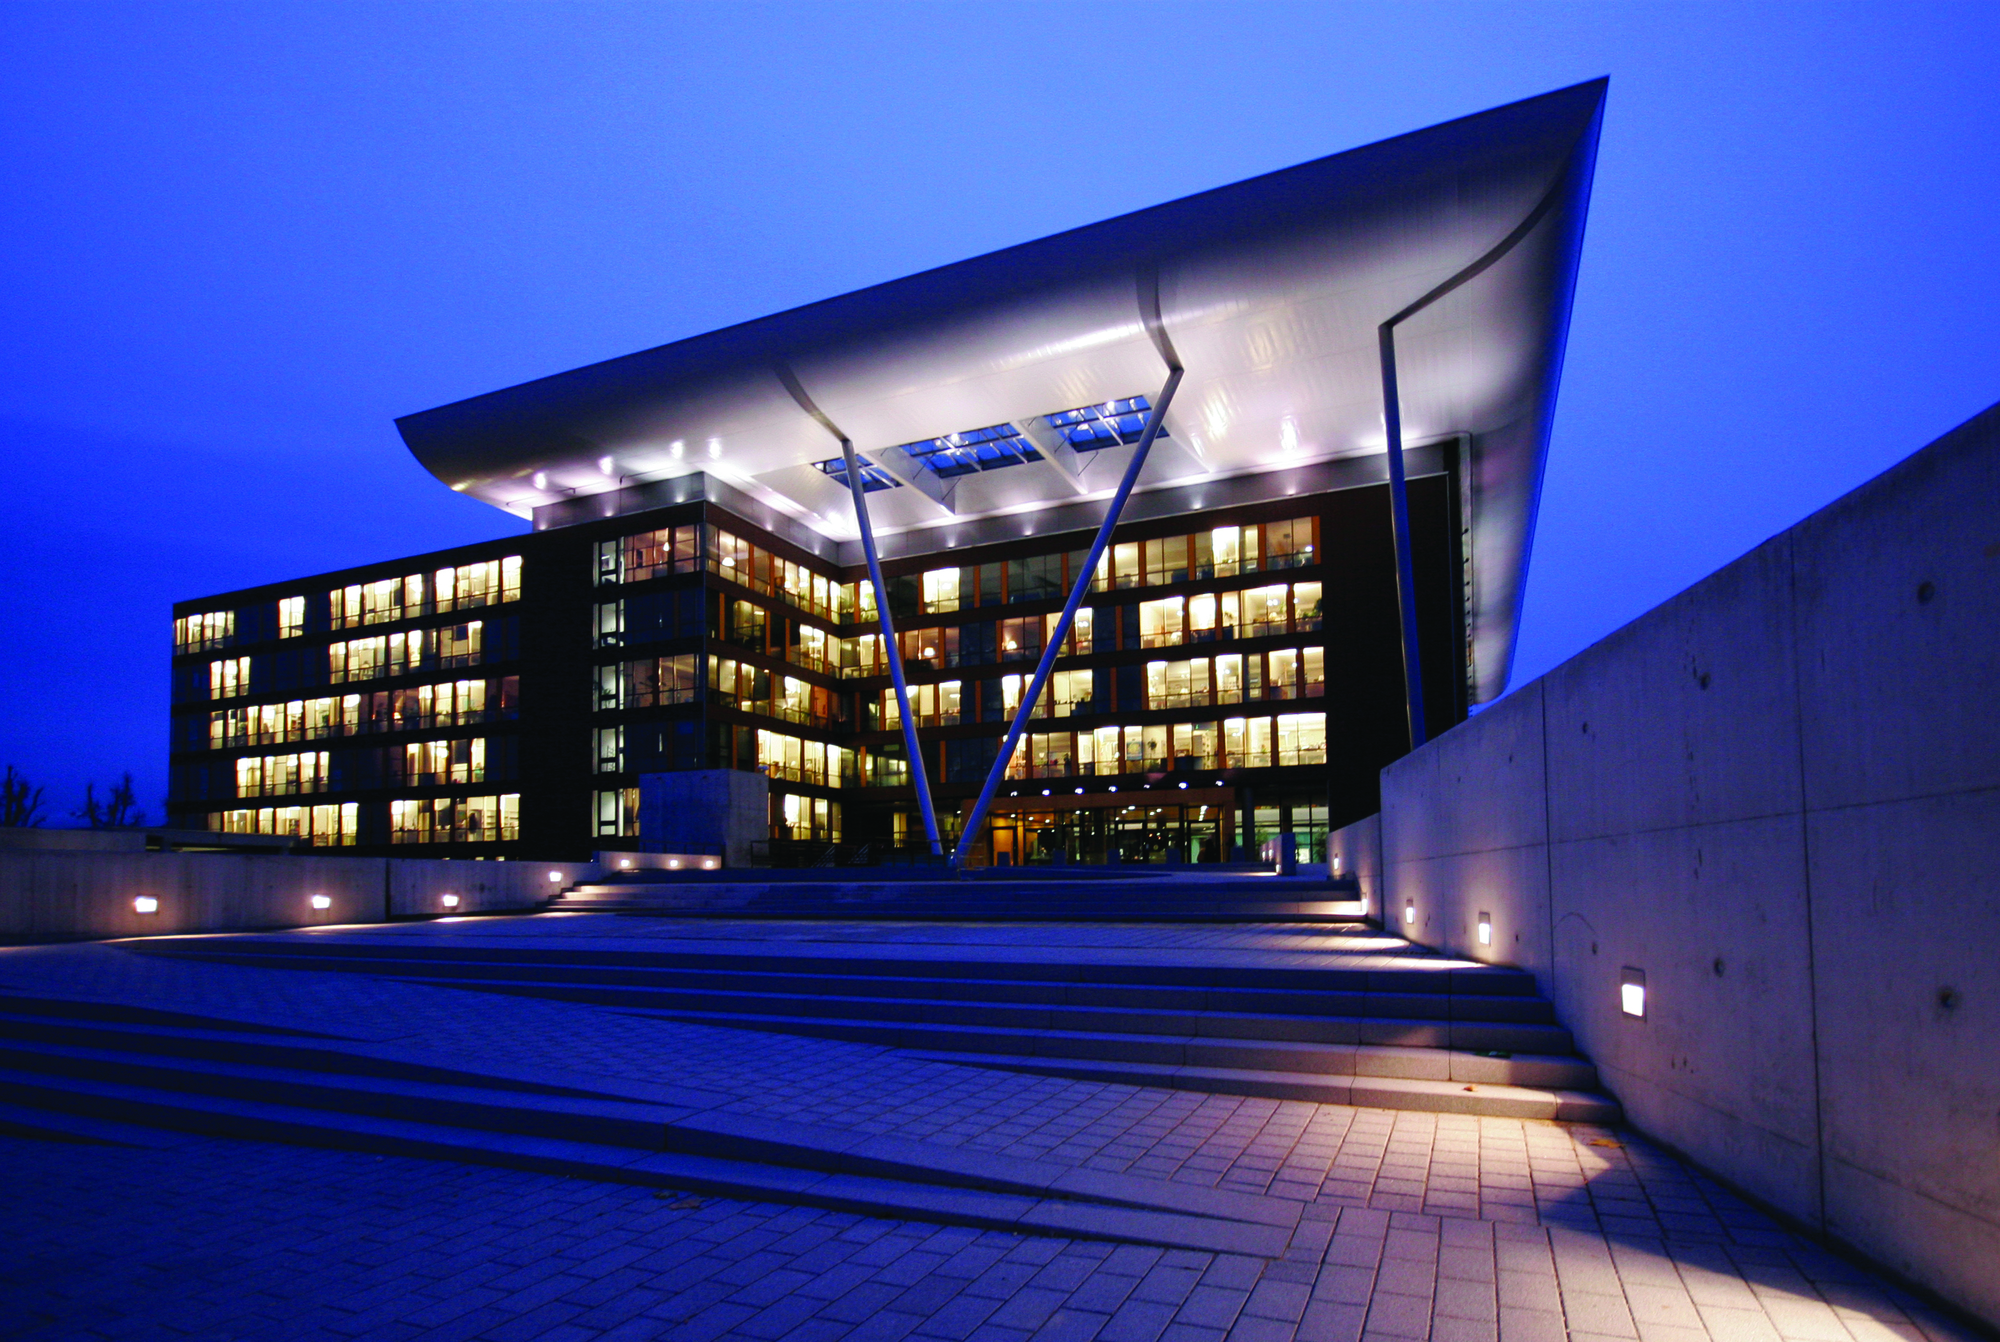 Conselho da Europa / Art&Build Architecs, Cortesia de Art&Build